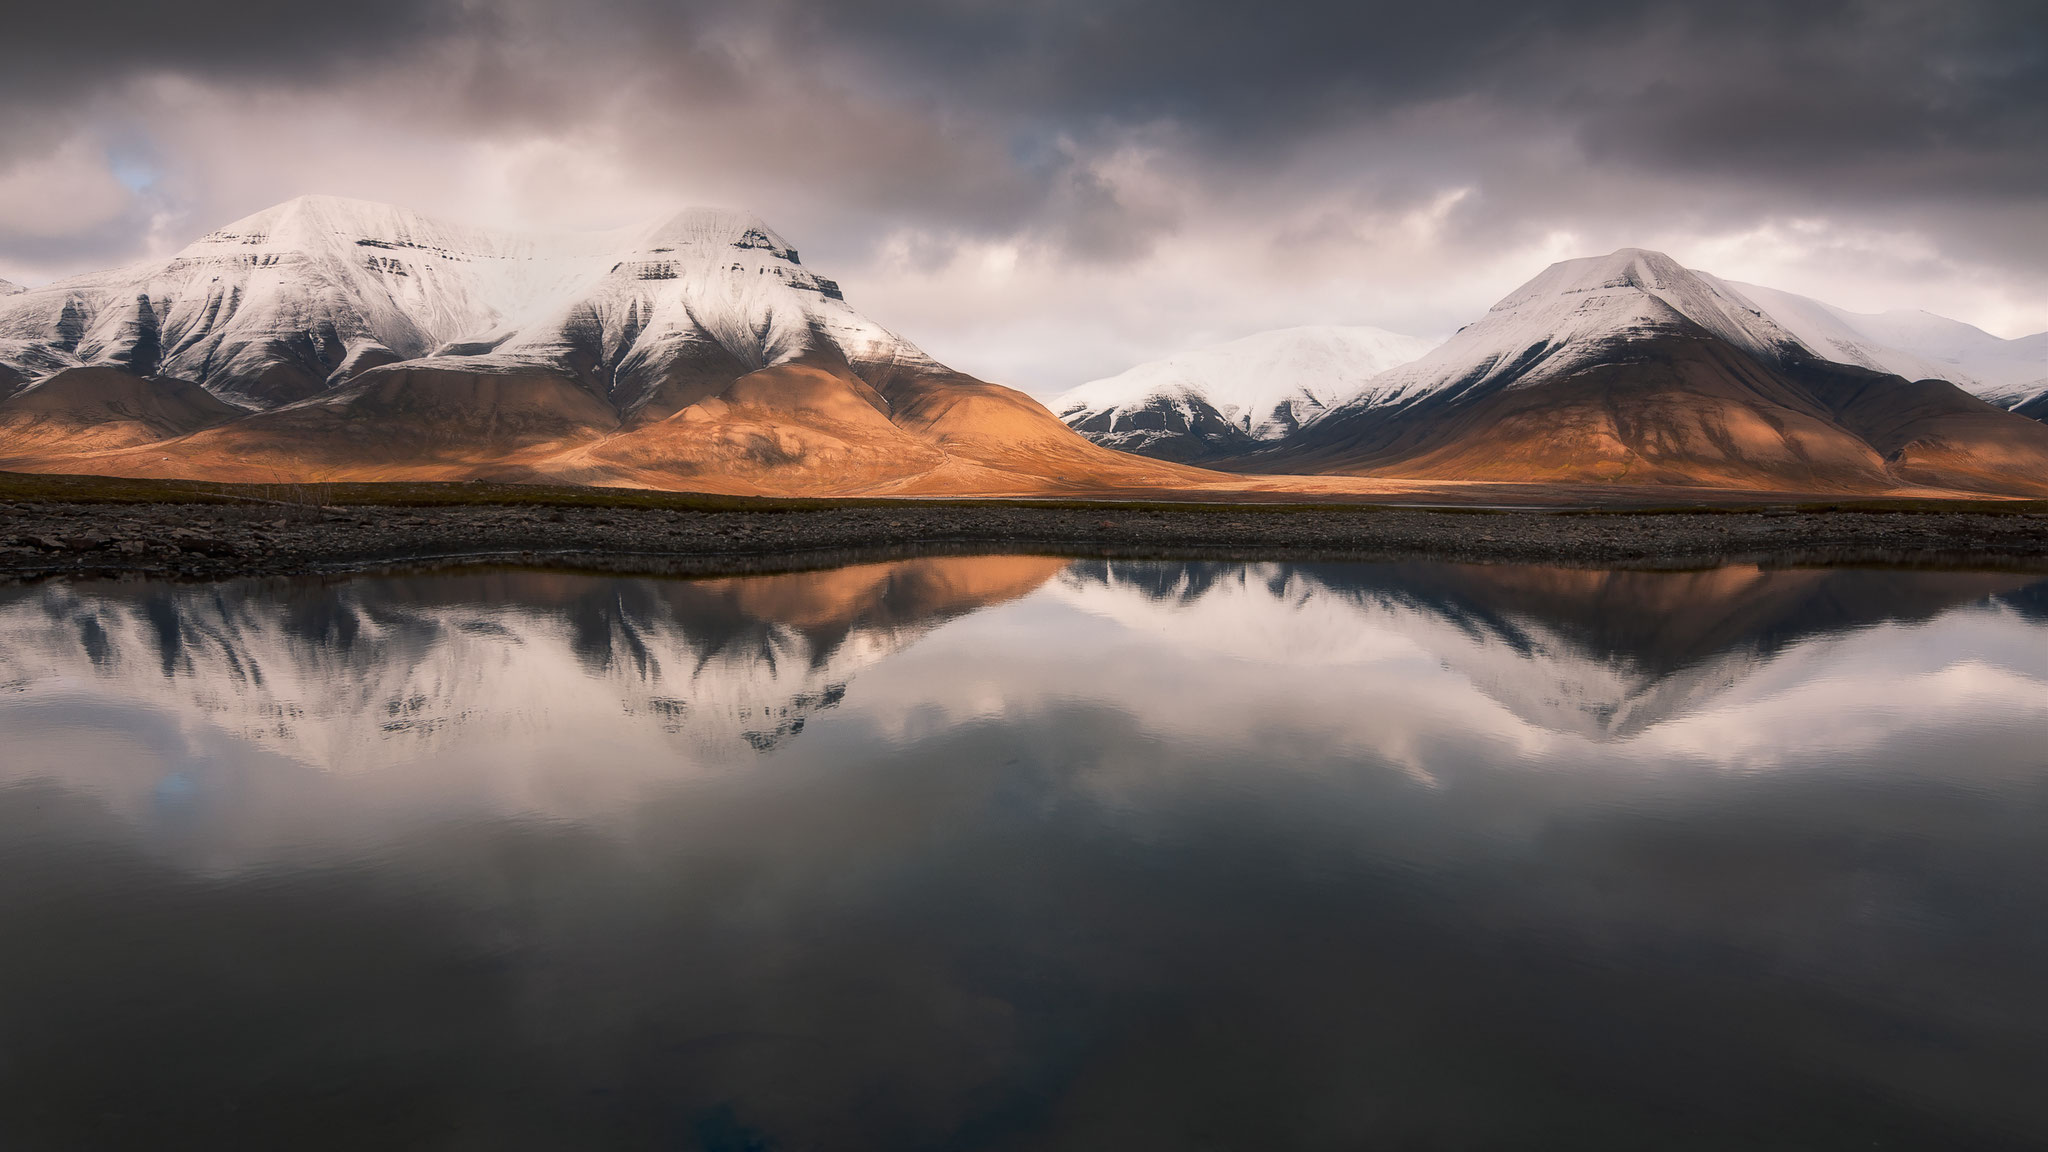 Csomai Dávid (Romania) - Serene arctic